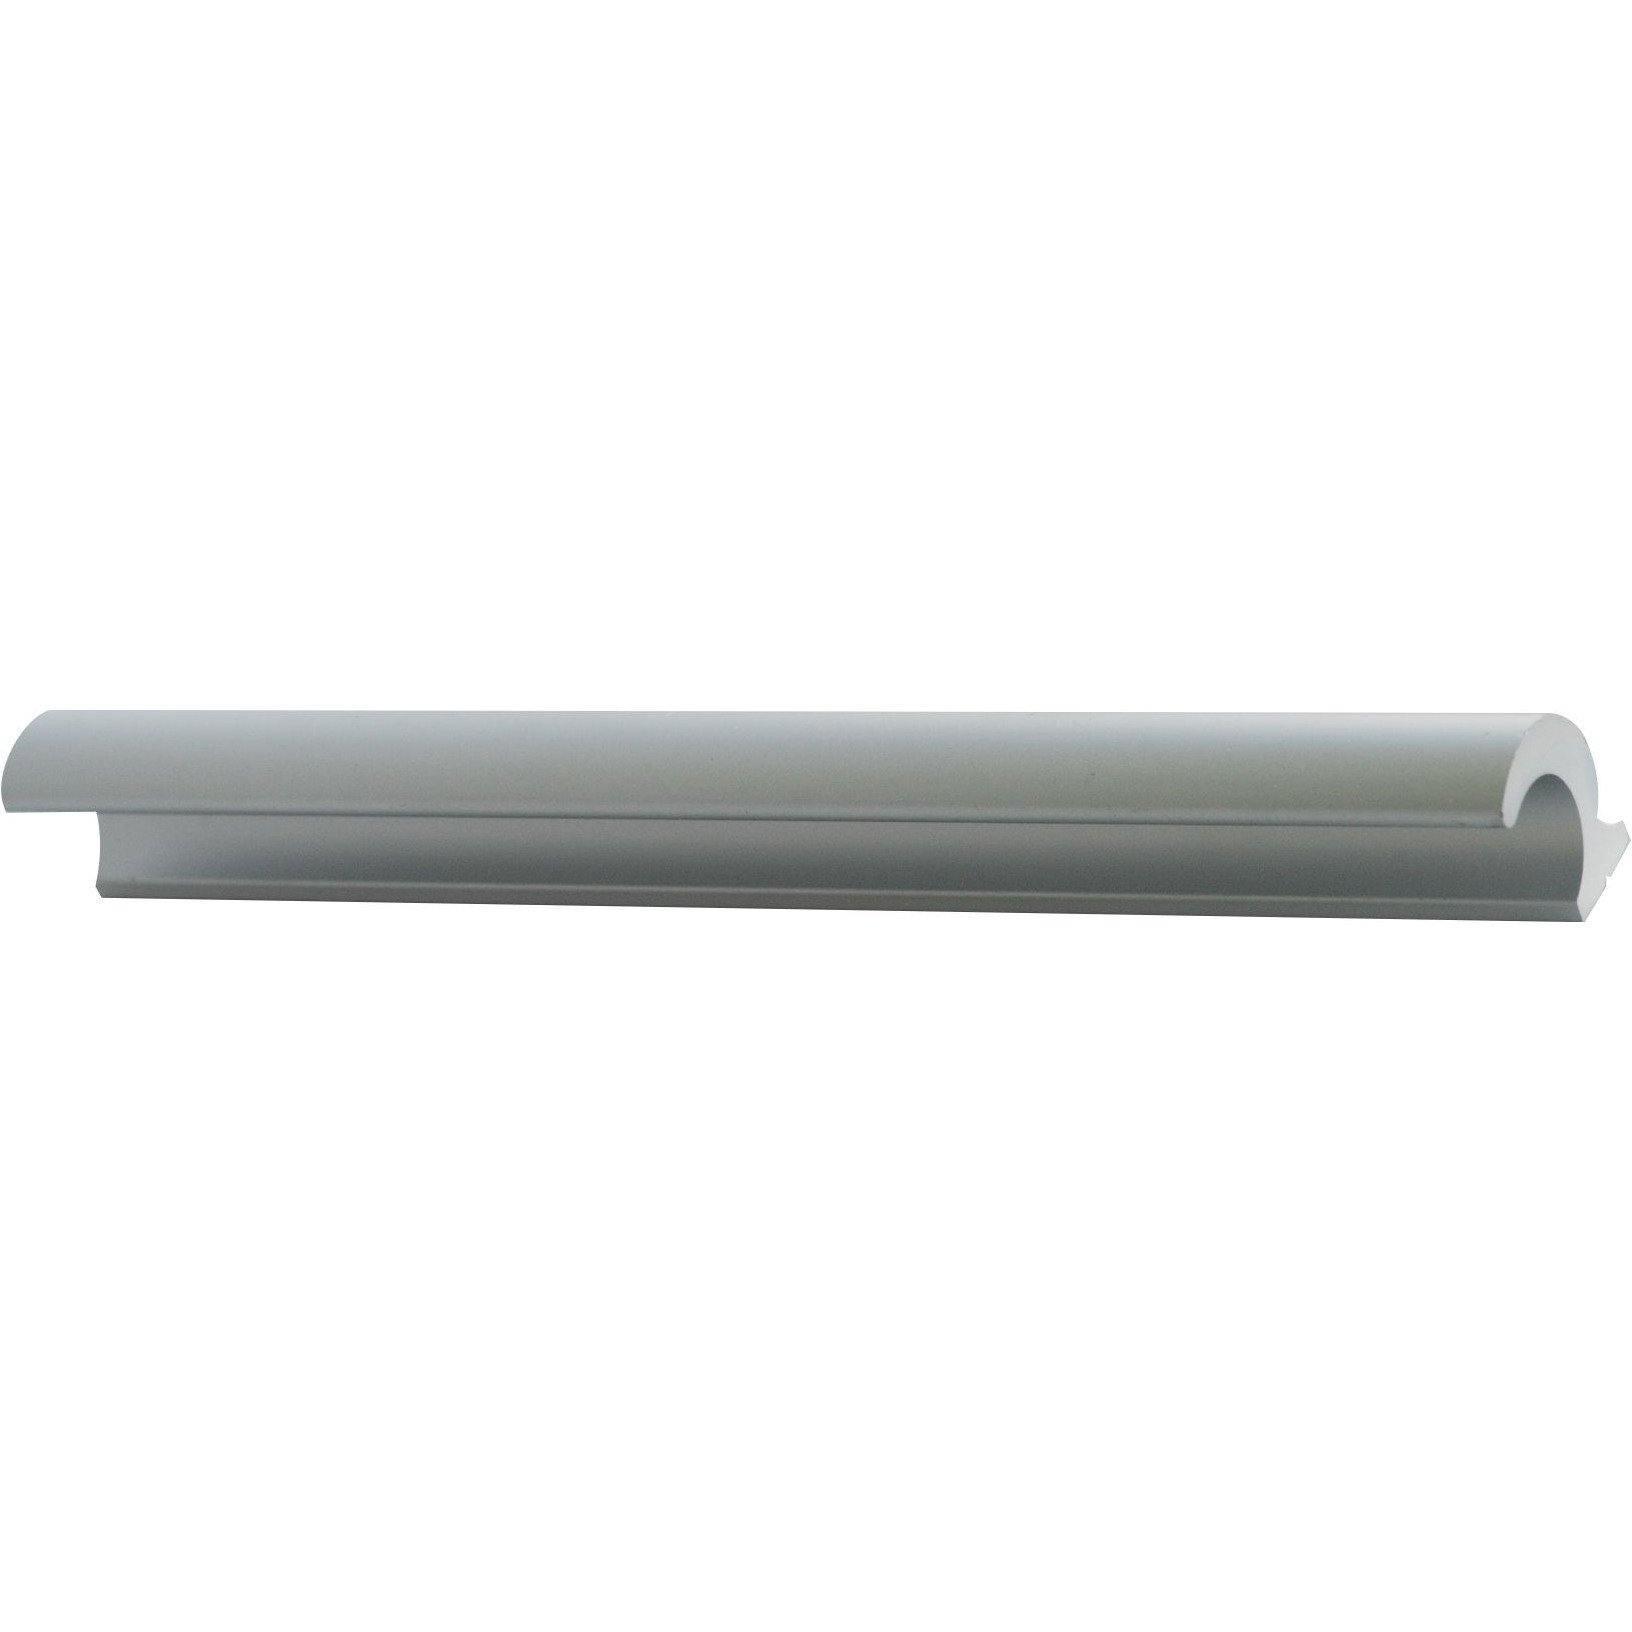 Aluminium grip handle - natural anodised.